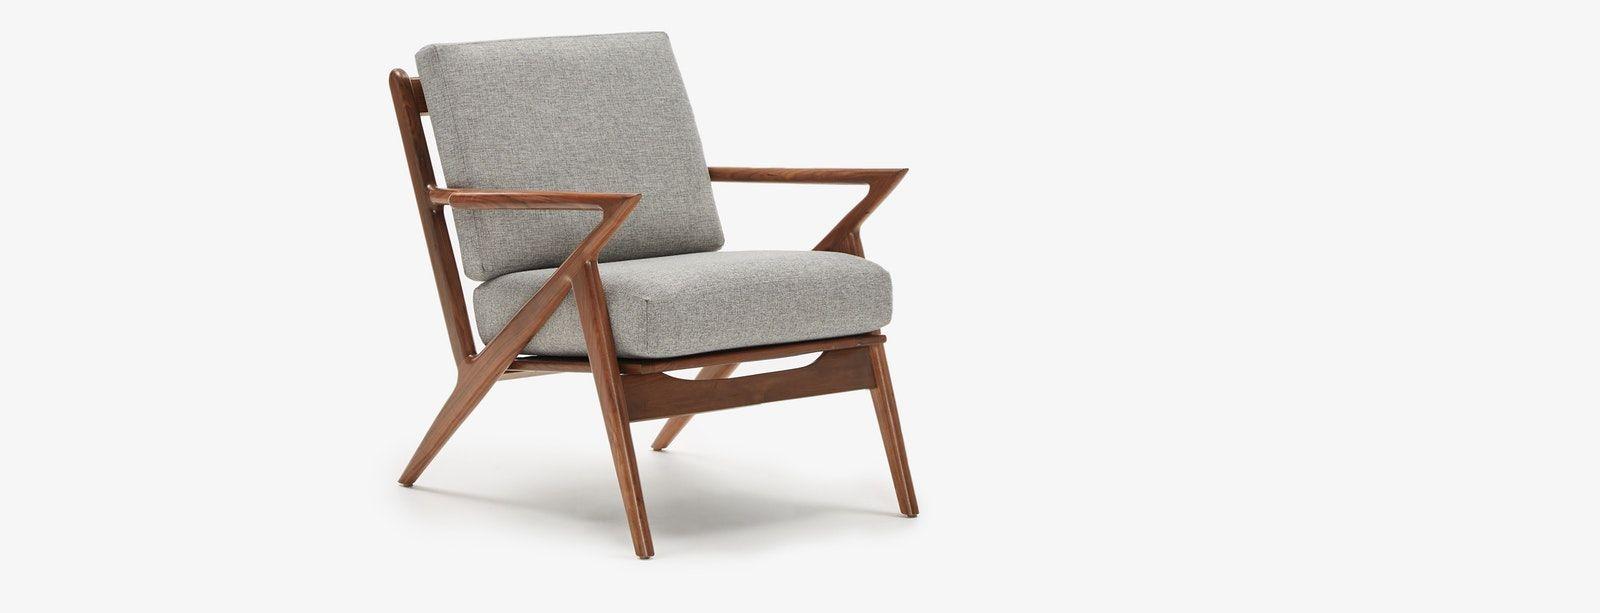 Joybird Soto Chair